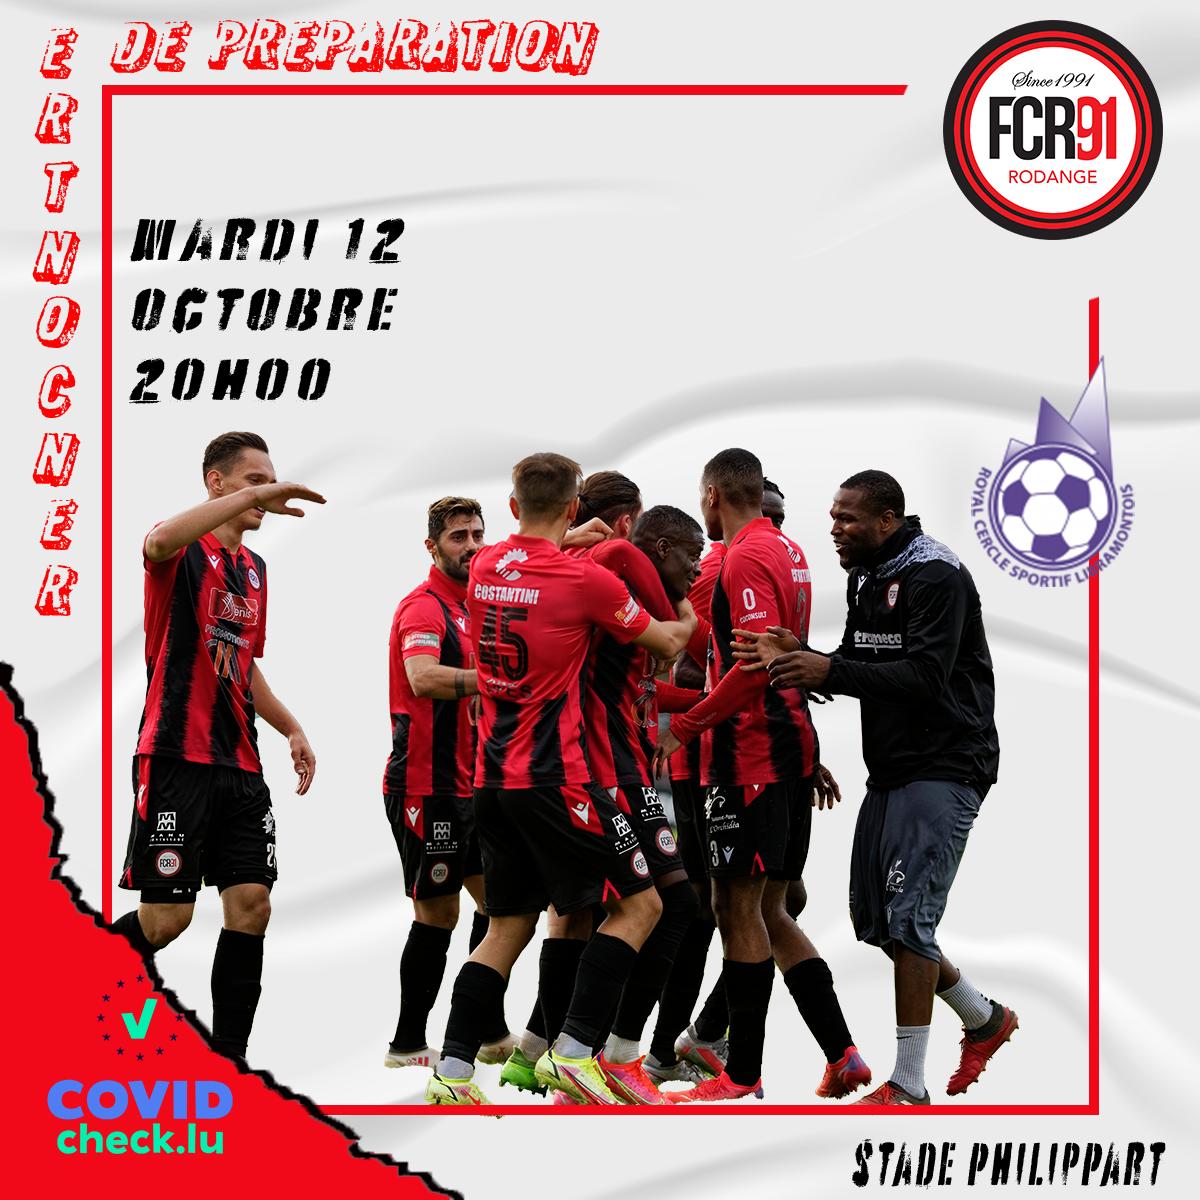 FC Rodange 91 - R.C.S. Libramontois